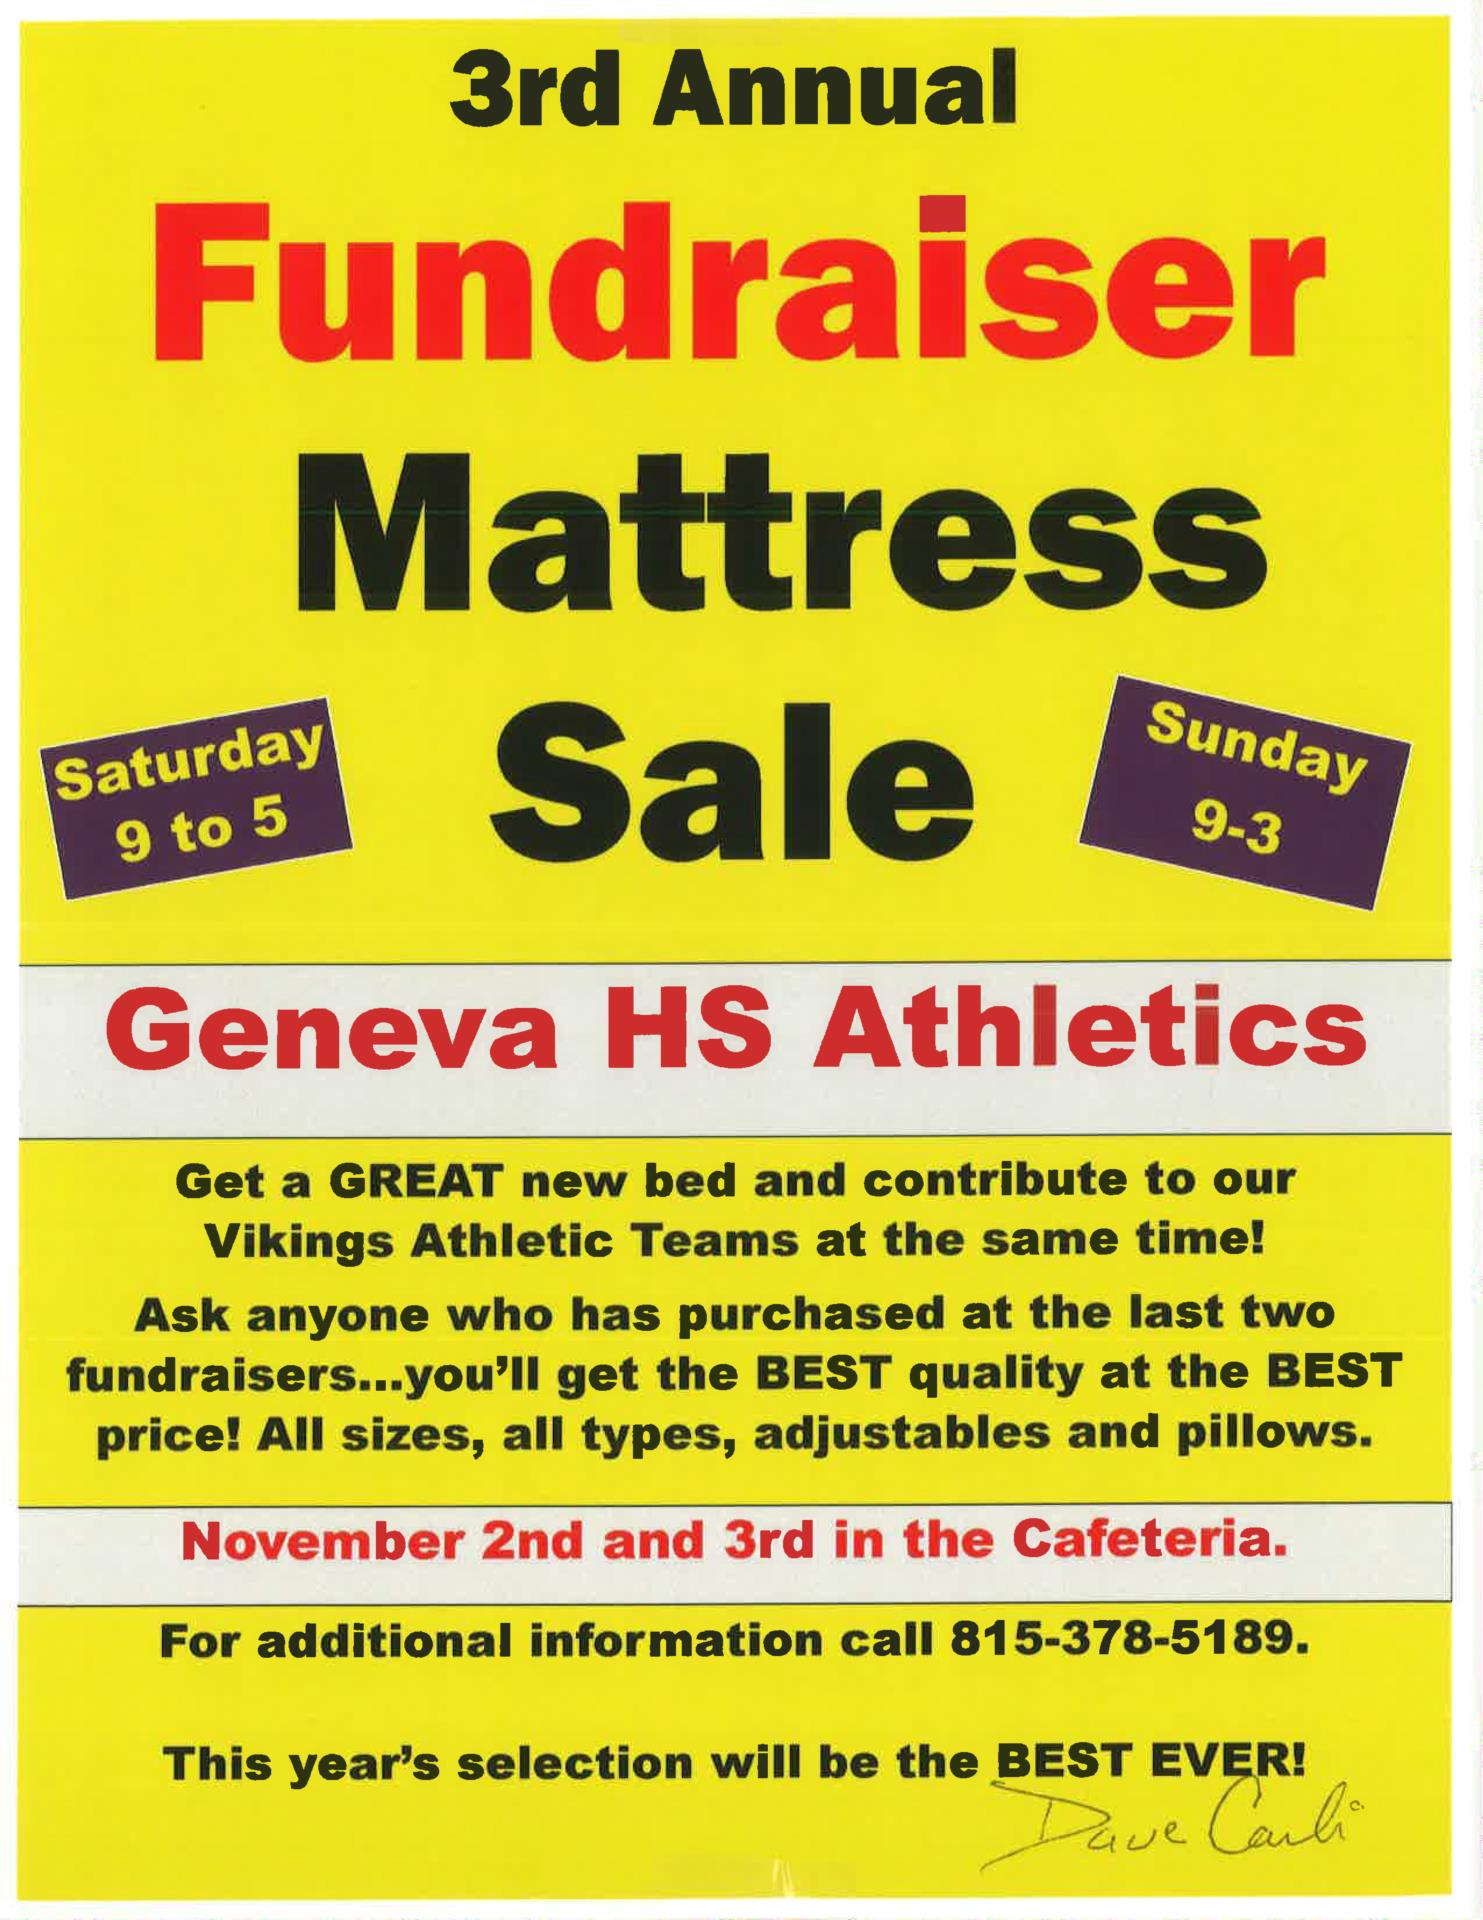 3rd Annual Mattress Fundraiser